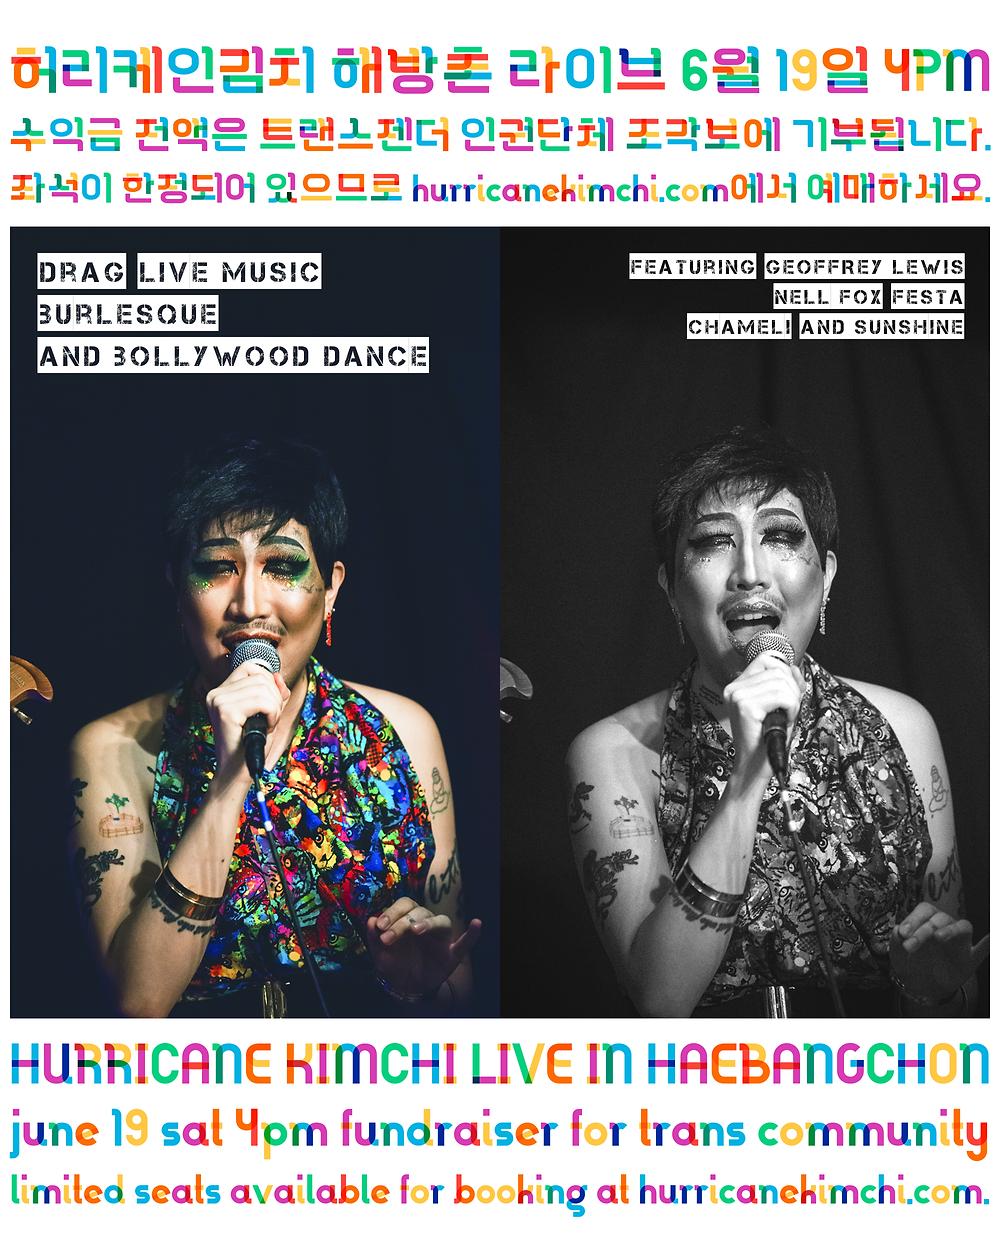 korean lgbtq queer artist activist drag queen hurricane kimchi aka heezy yang fundraiser show for transgender community organisation jogakbo 트랜스젠더 인권단체 조각보 기부금 마련을 위한 펀드레이저 한국인 퀴어 성소수자 아티스트 활동가 허리케인 김치 히지 양 공연